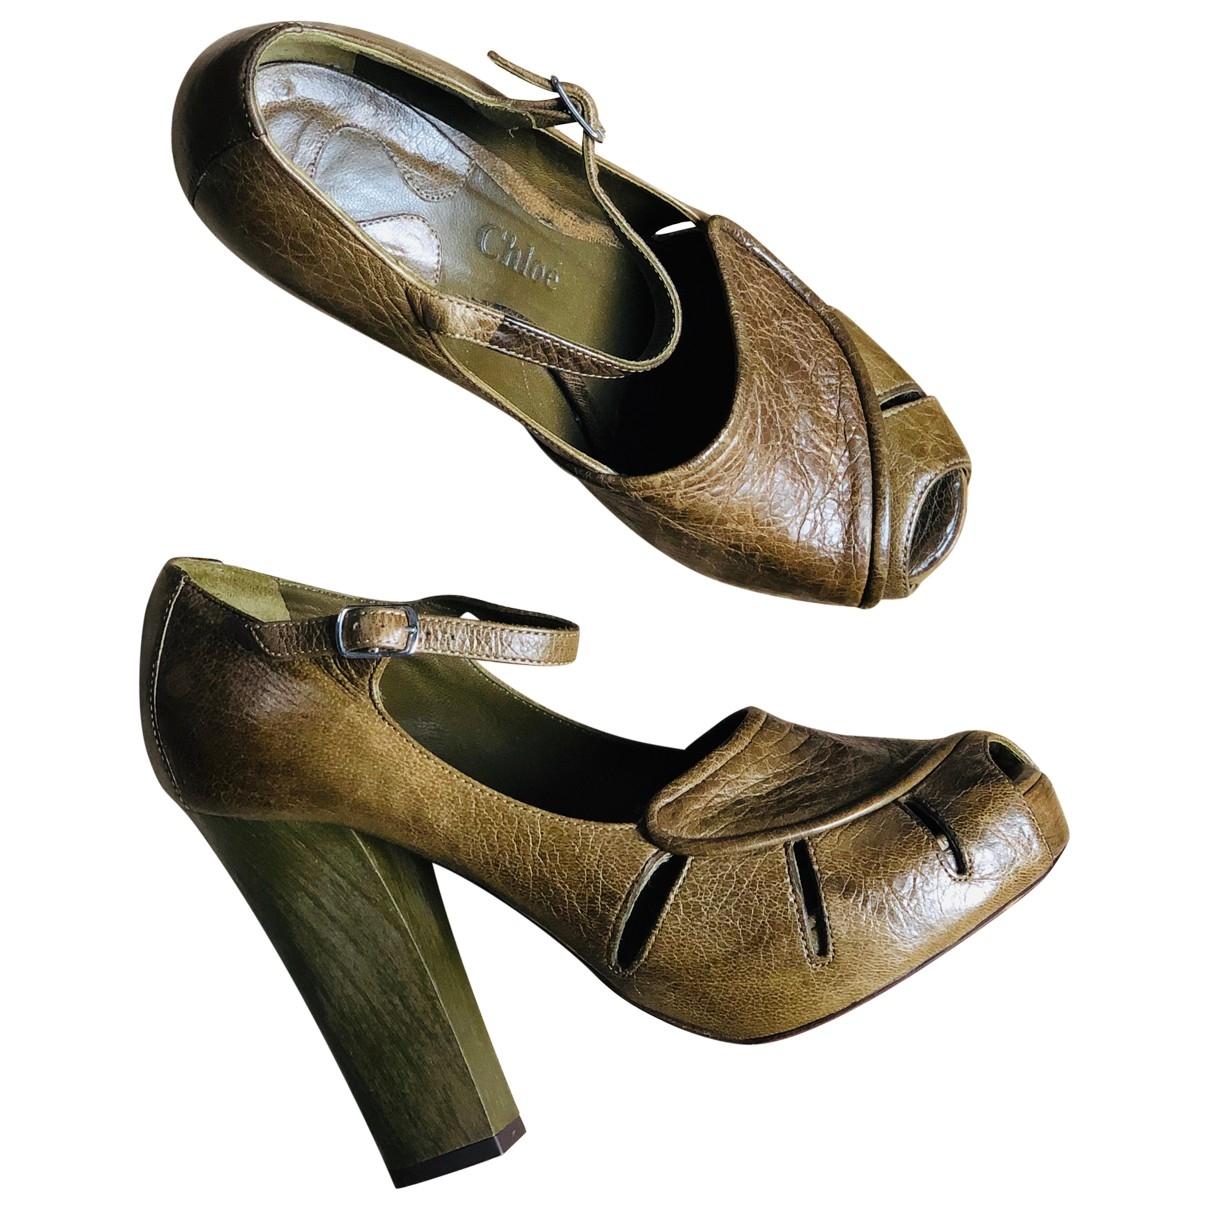 Chloe - Escarpins   pour femme en cuir - kaki